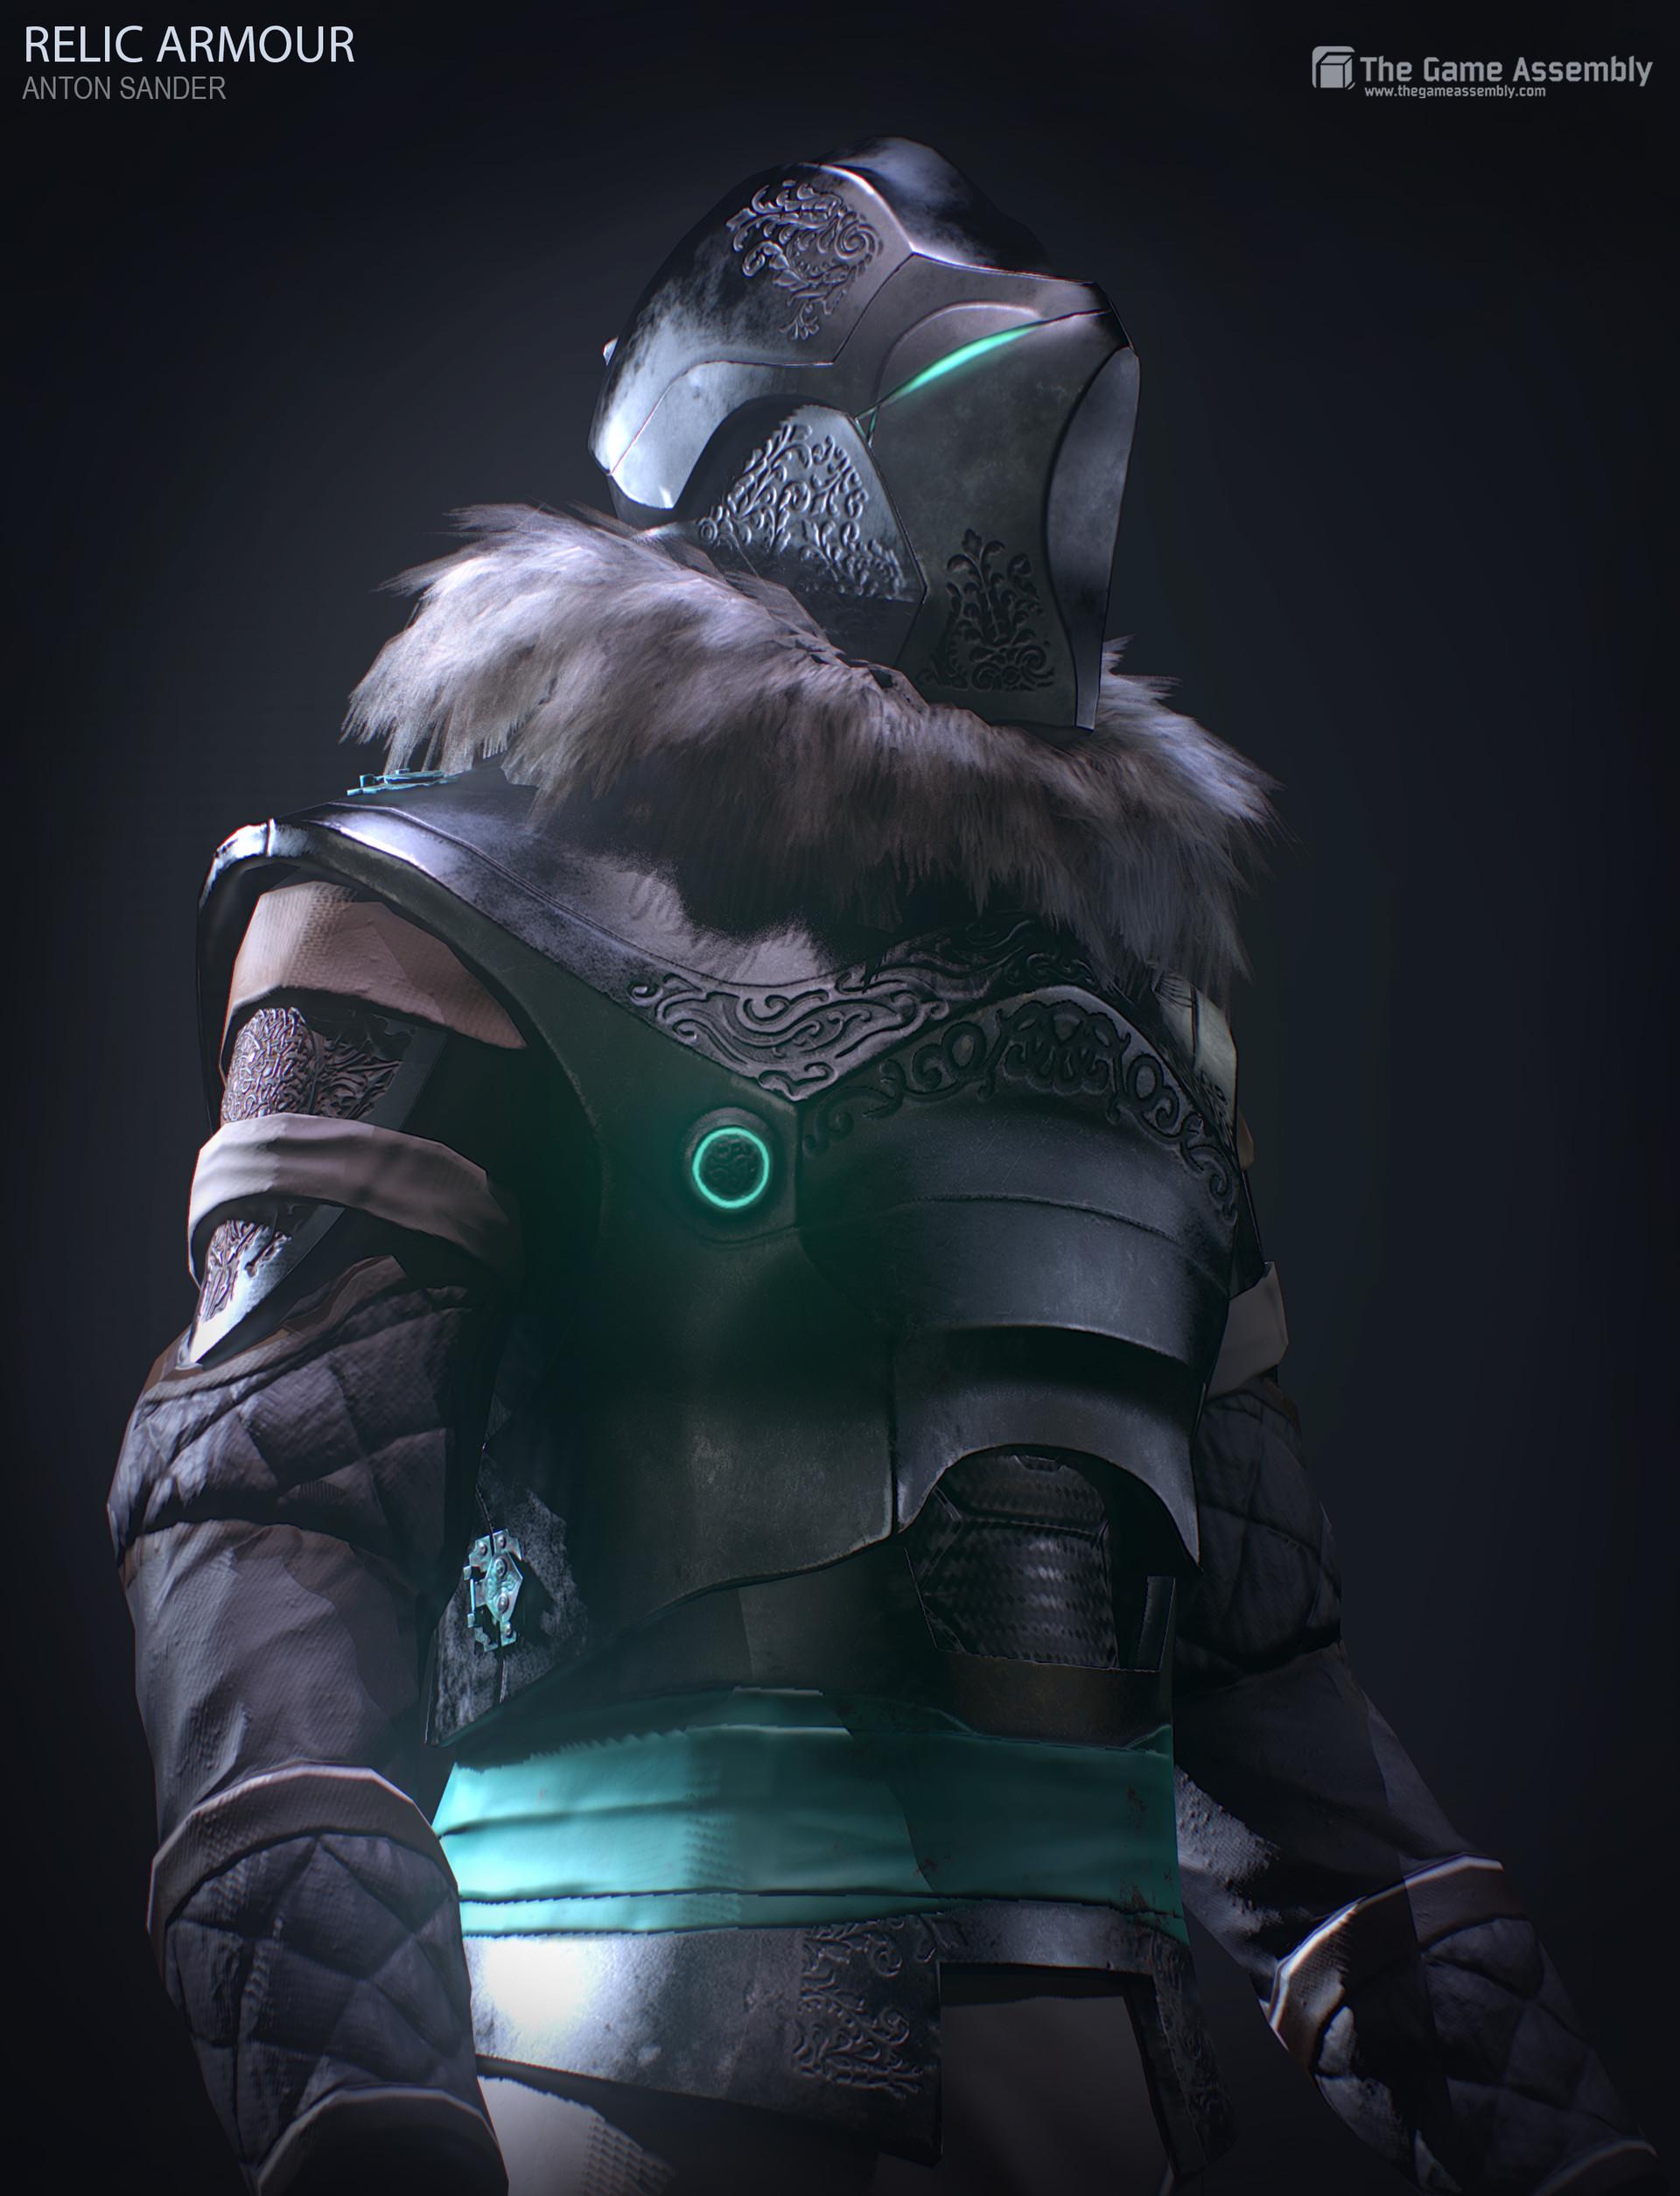 Anton sander relic armour b